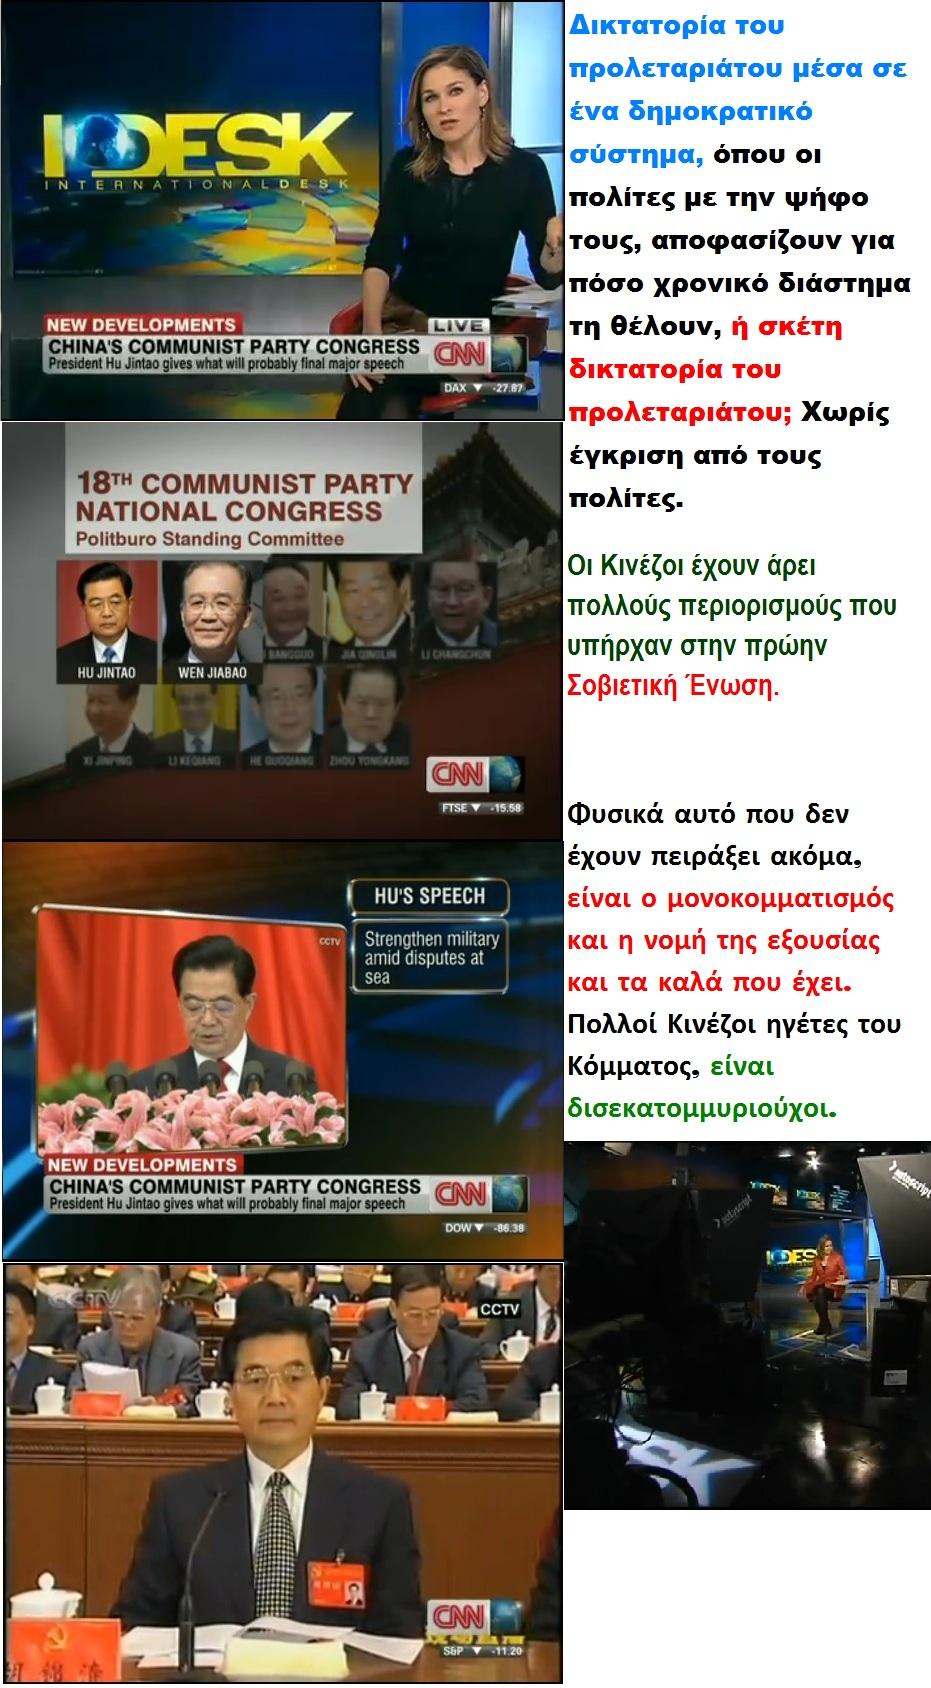 CNN CHINAS COMMUNIST PARTY CONGRESS 01 01 081112